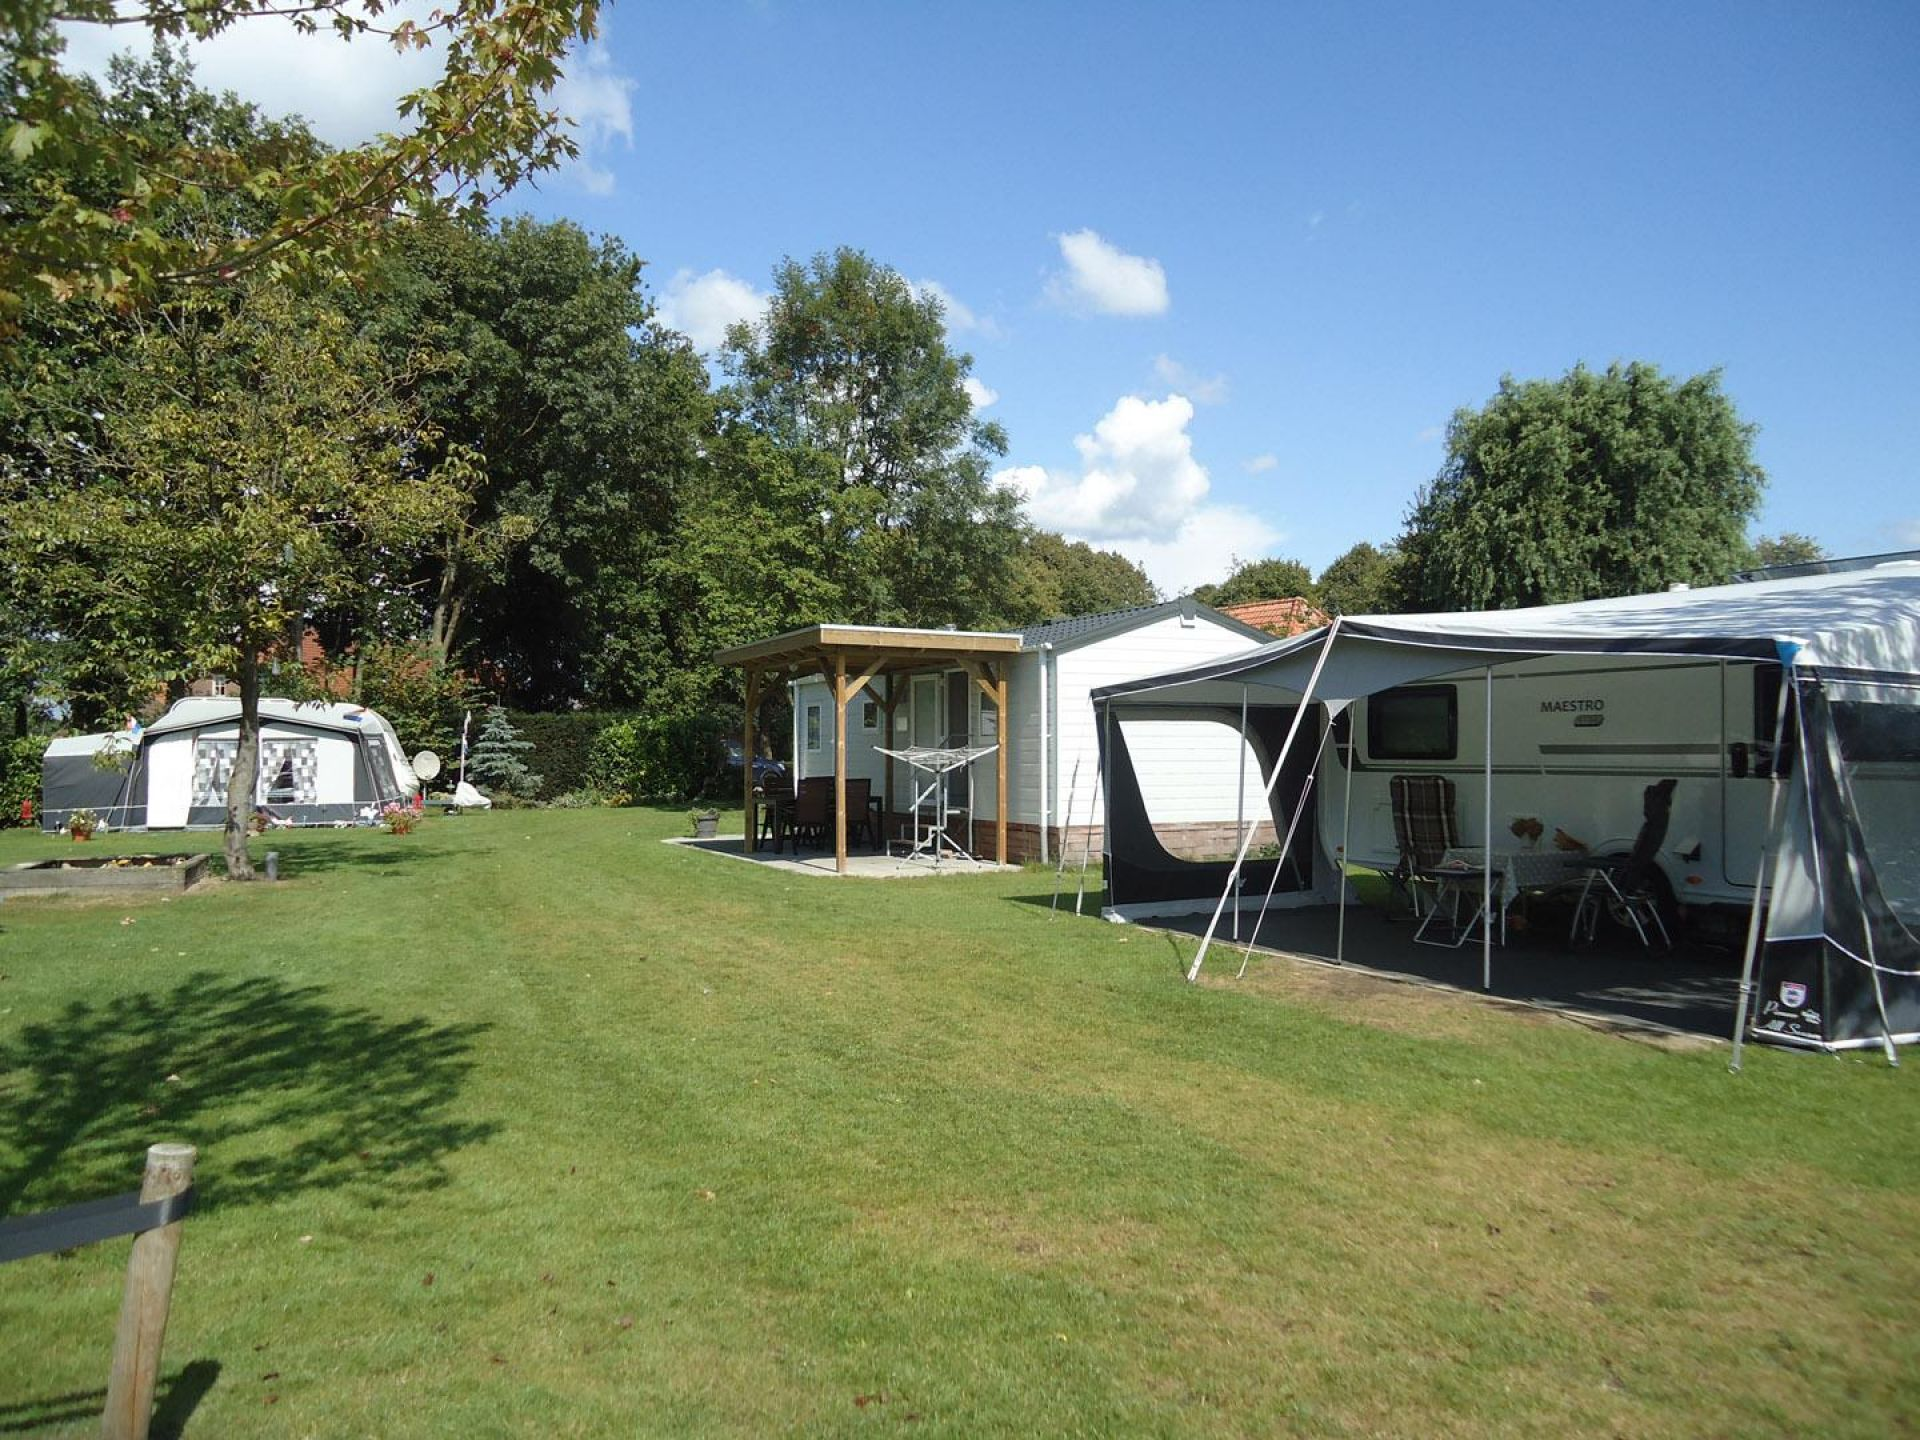 86bde32f339 Camping Anne-Marie Hoeve Oisterwijk